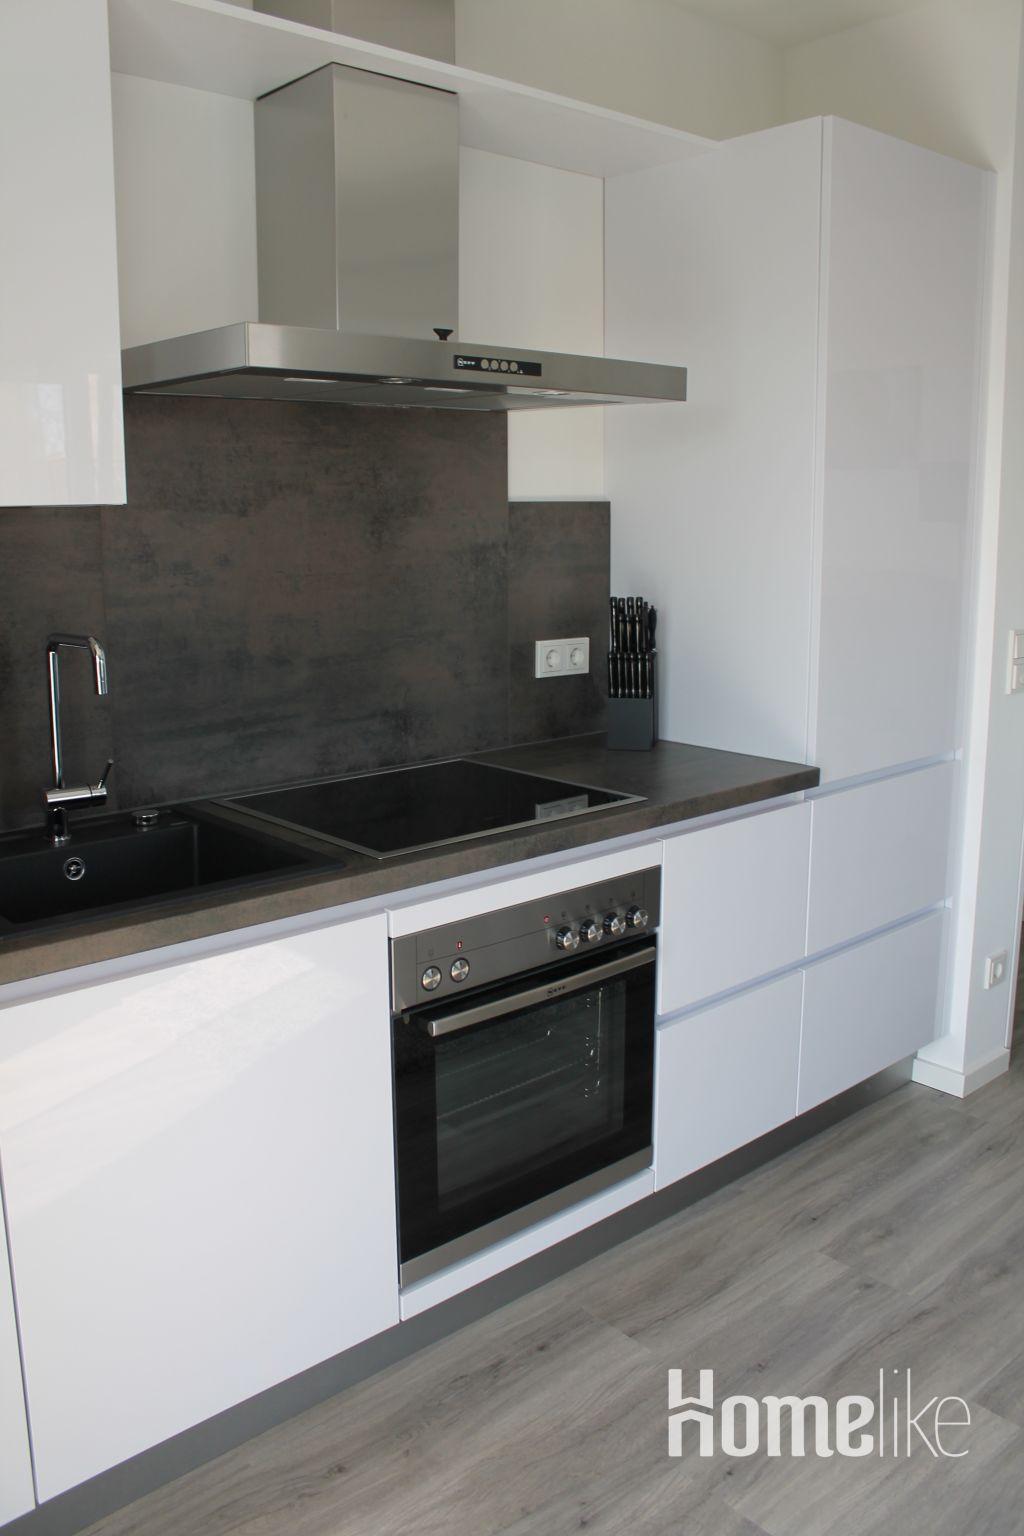 image 3 furnished 1 bedroom Apartment for rent in Sankt Augustin, Rhein-Sieg